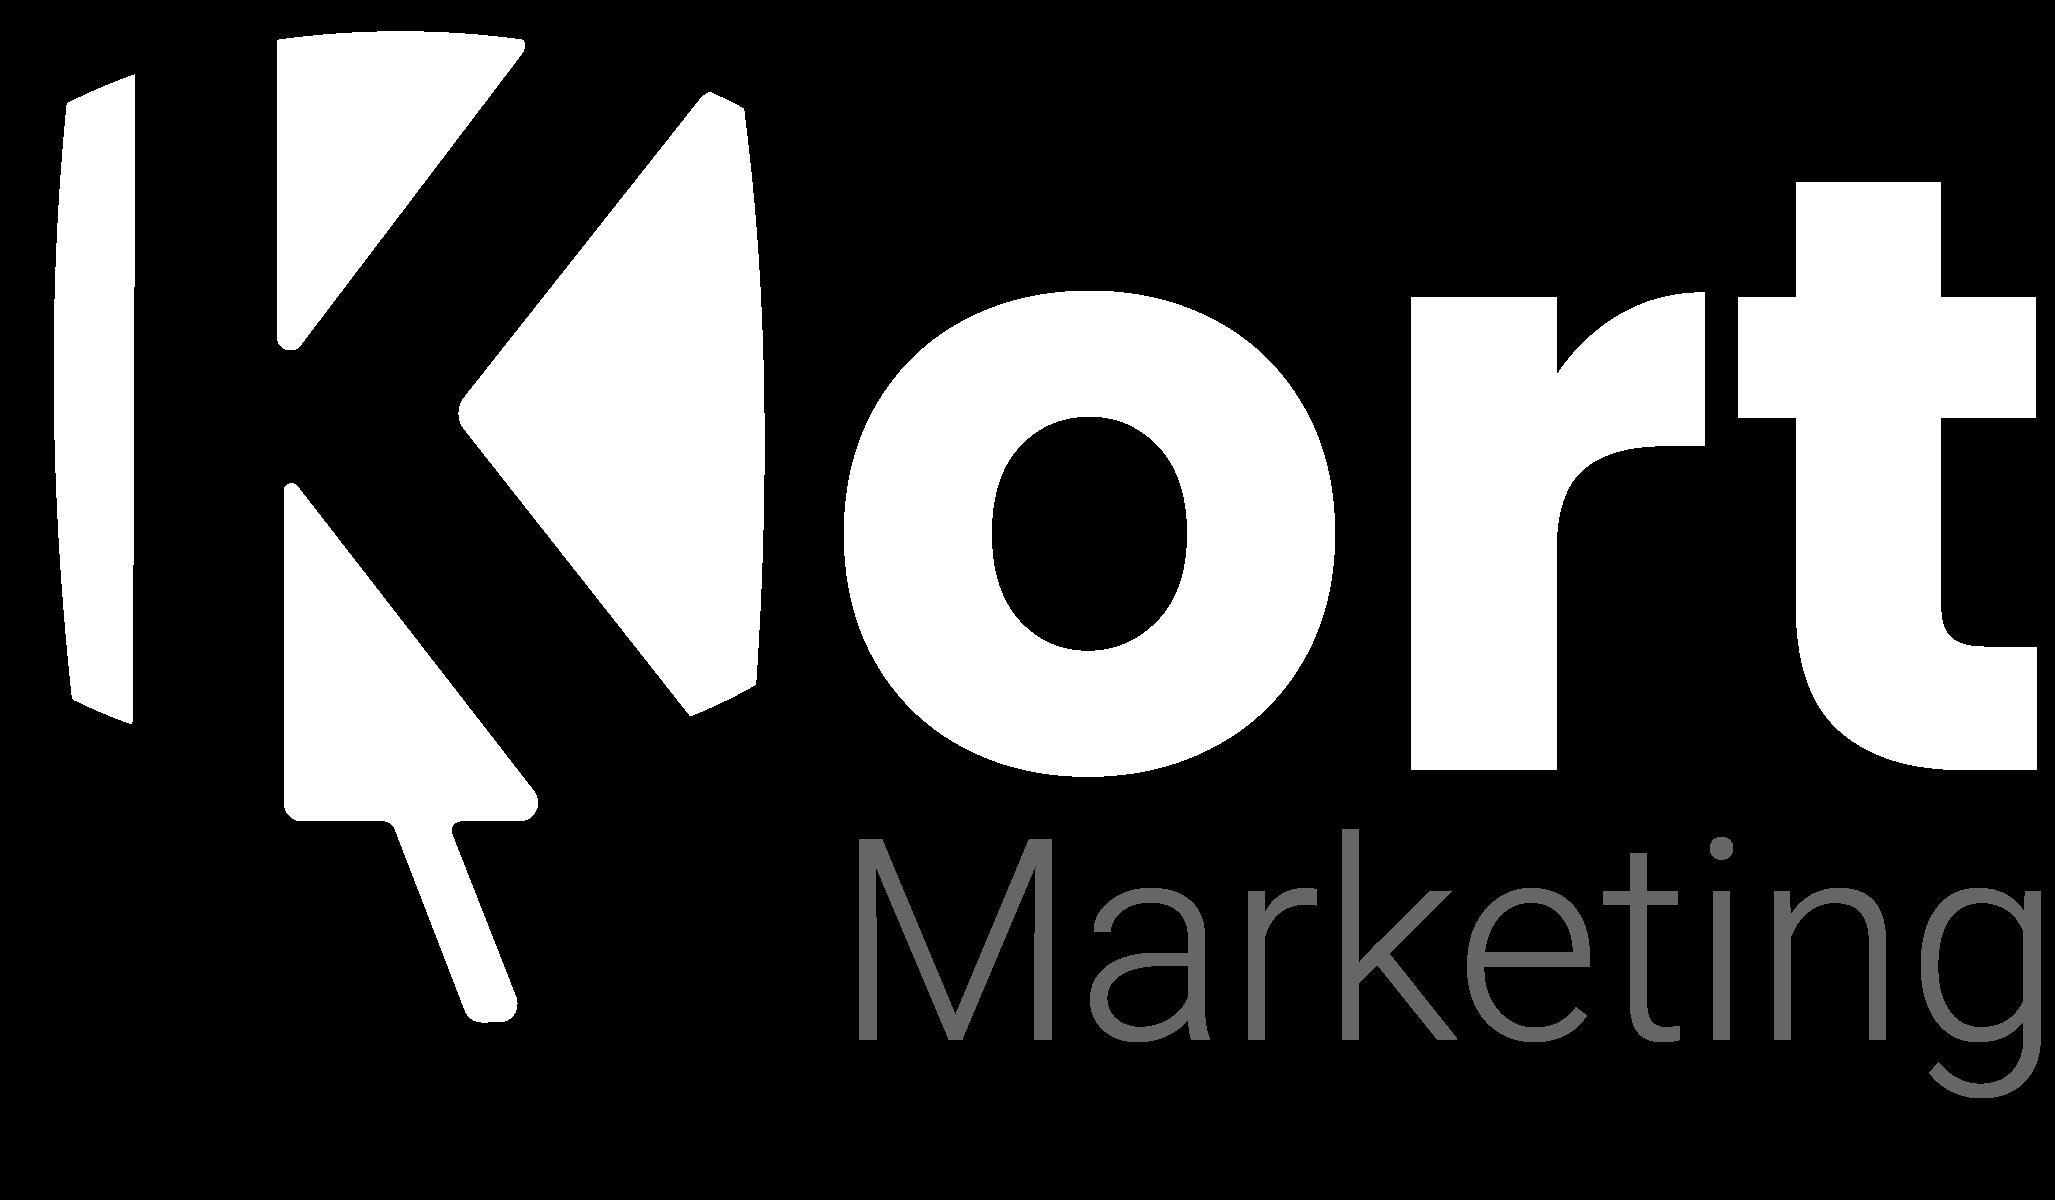 Kort Marketing